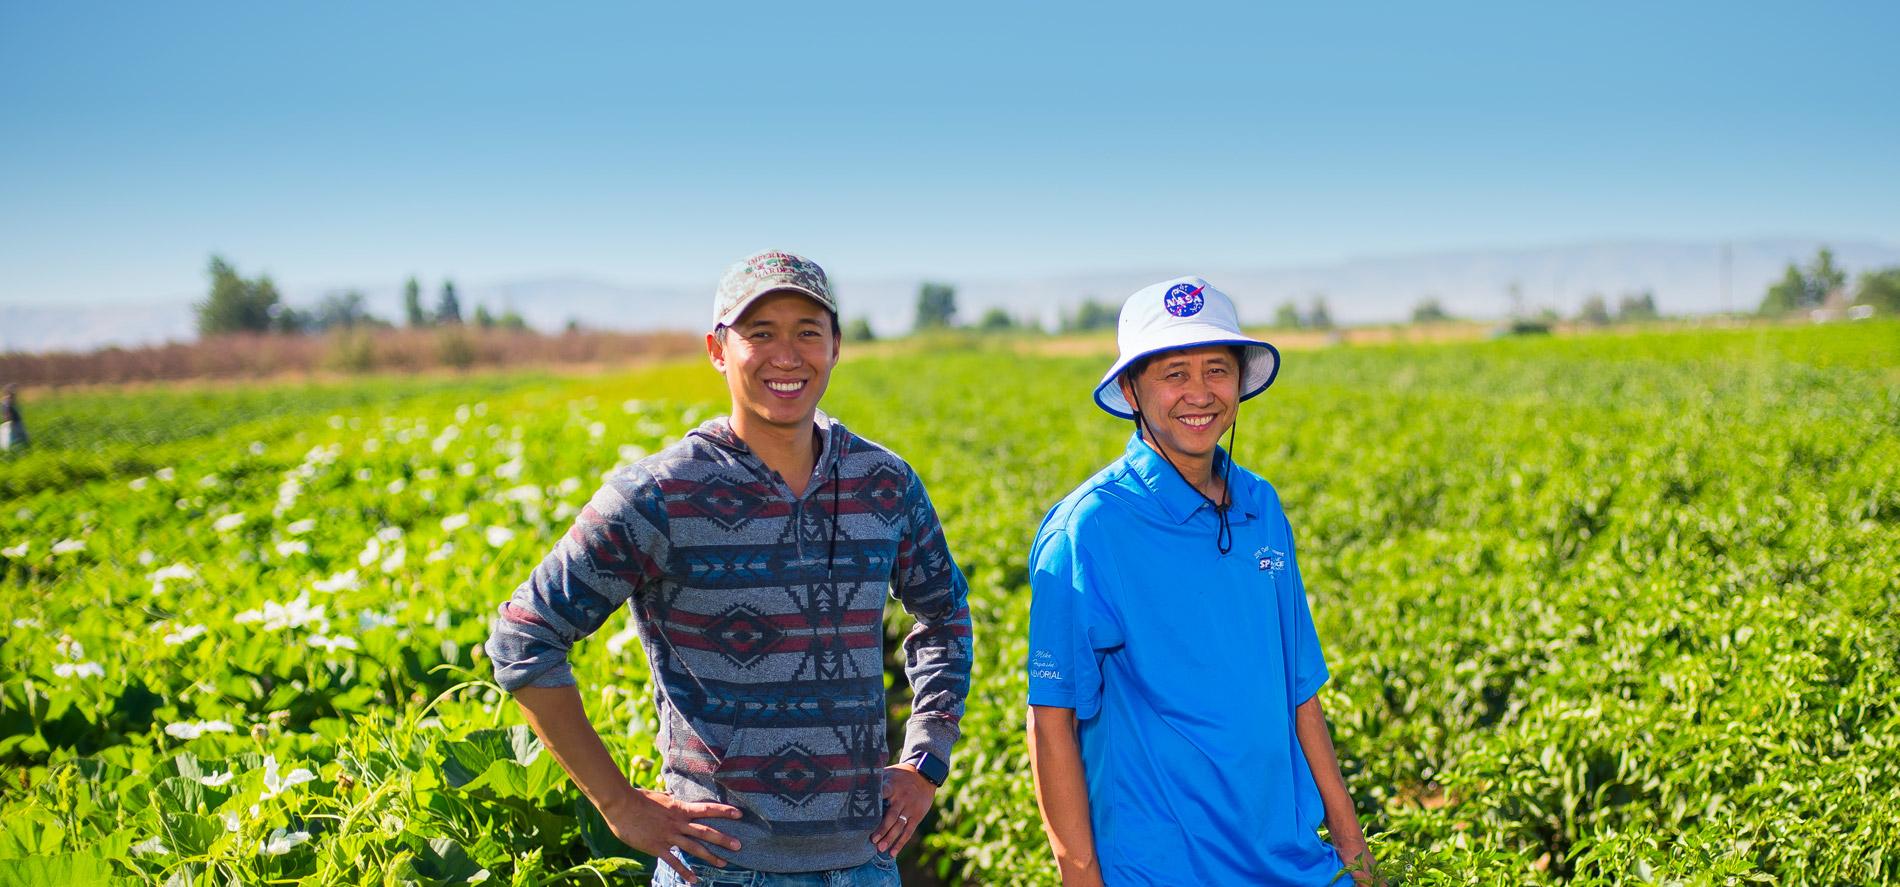 Imperial's Garden - Yakima Valley Produce